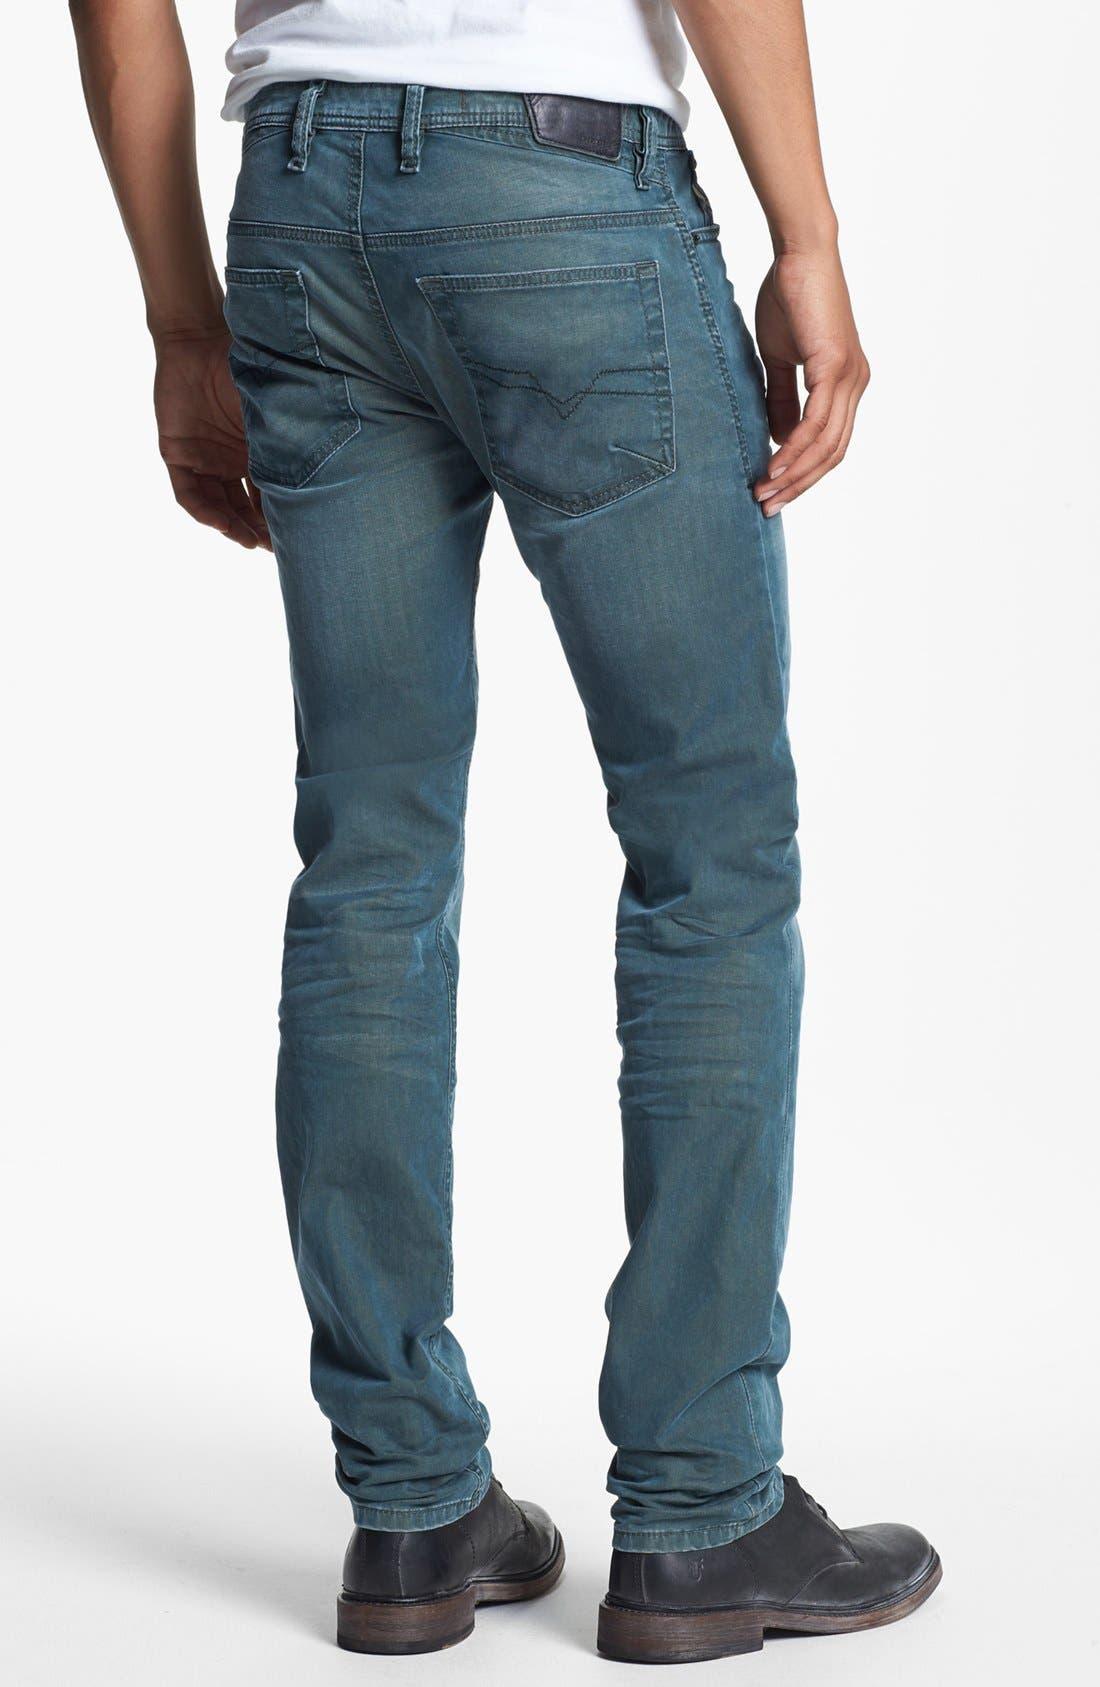 Alternate Image 1 Selected - DIESEL® 'Shioner' Skinny Fit Jeans (0603B)